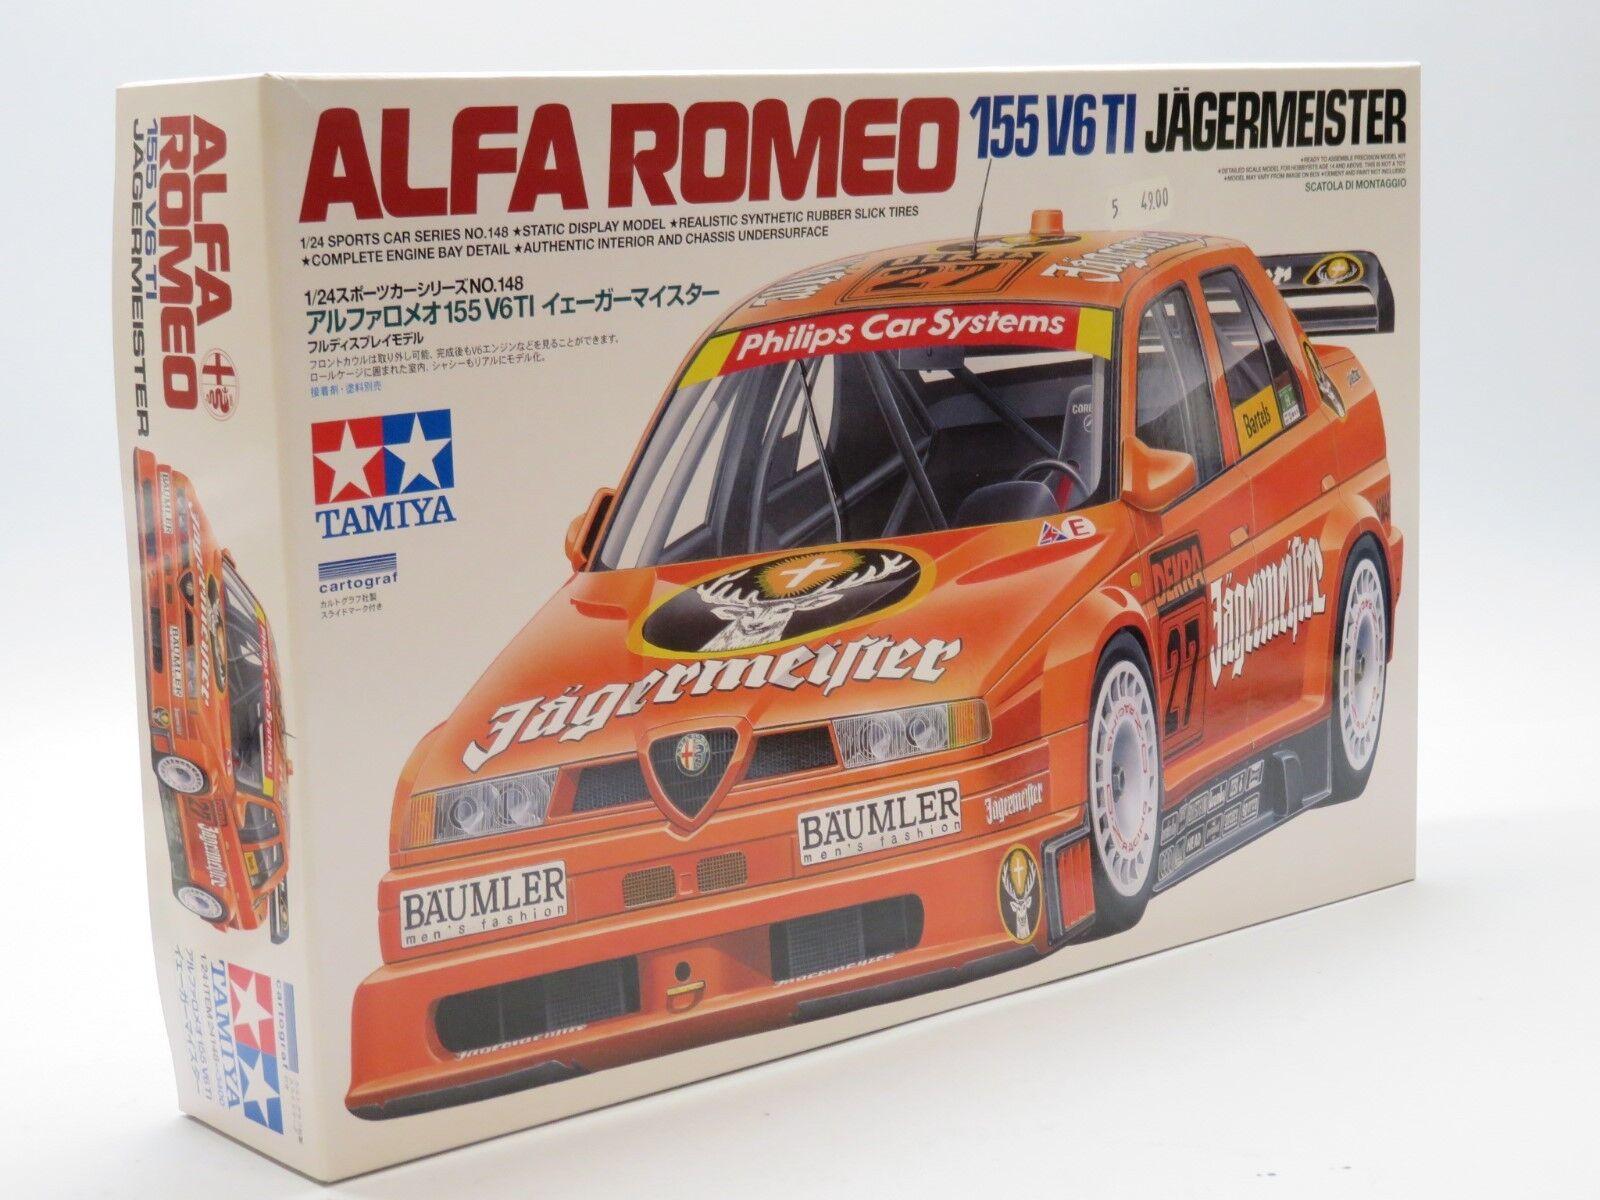 Tamiya 24148 1 24 Maquette Alfa Roméo 155 V6 TI Jägermeister